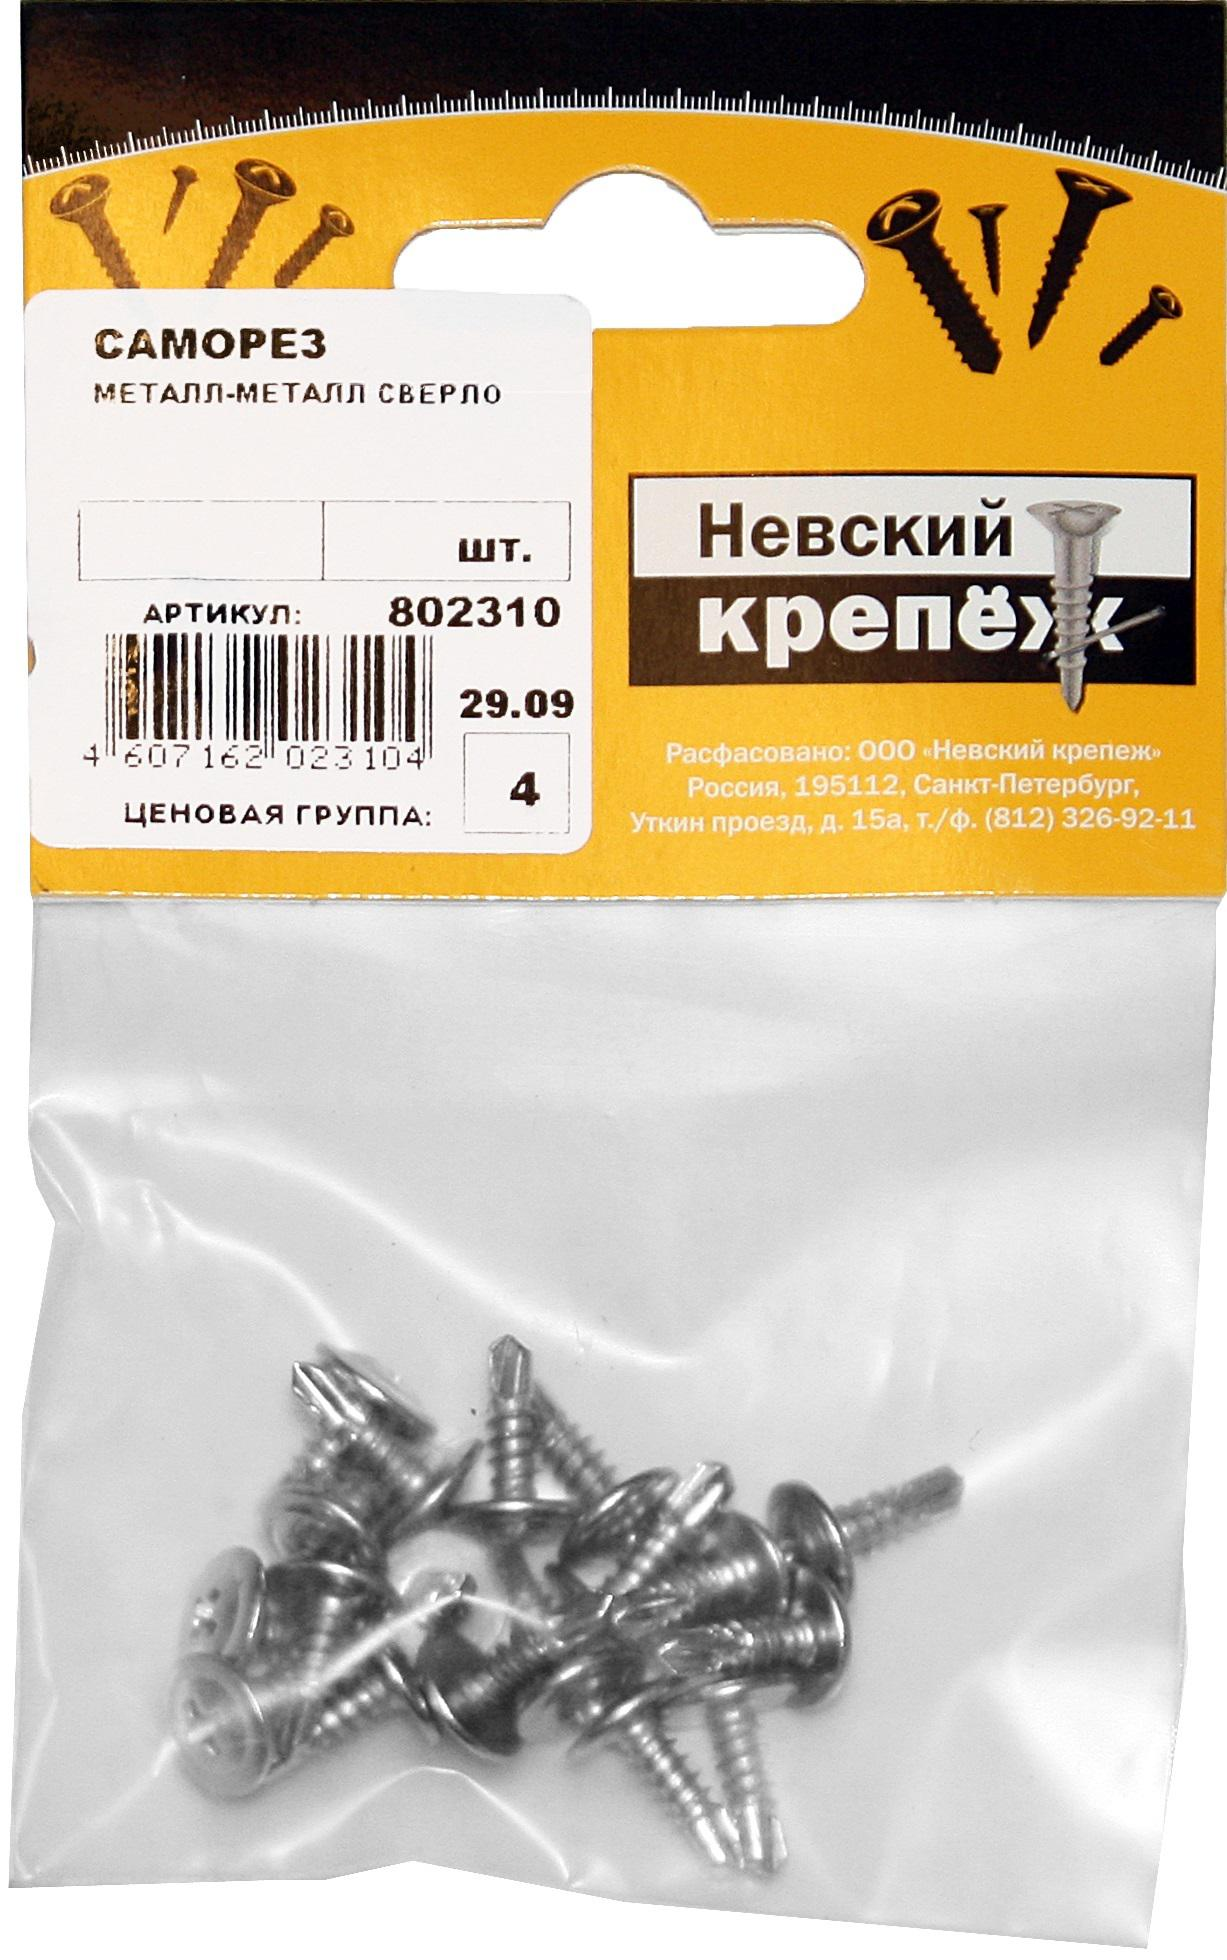 Саморез НЕВСКИЙ КРЕПЕЖ 802312